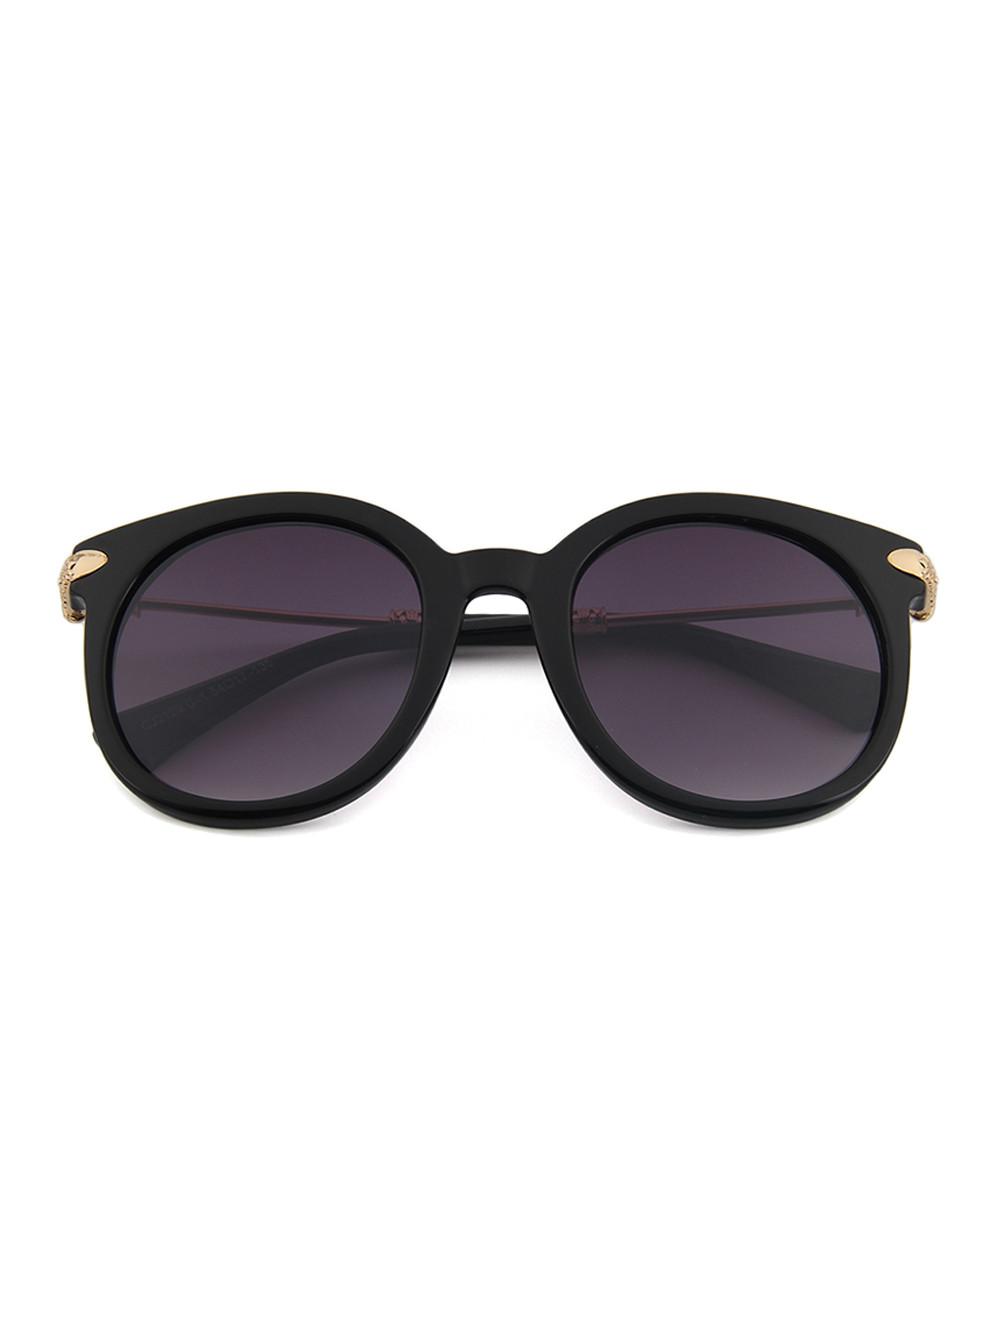 Slnečné okuliare Amélia Black · Slnečné okuliare Amélia Black ... 8d78af49677